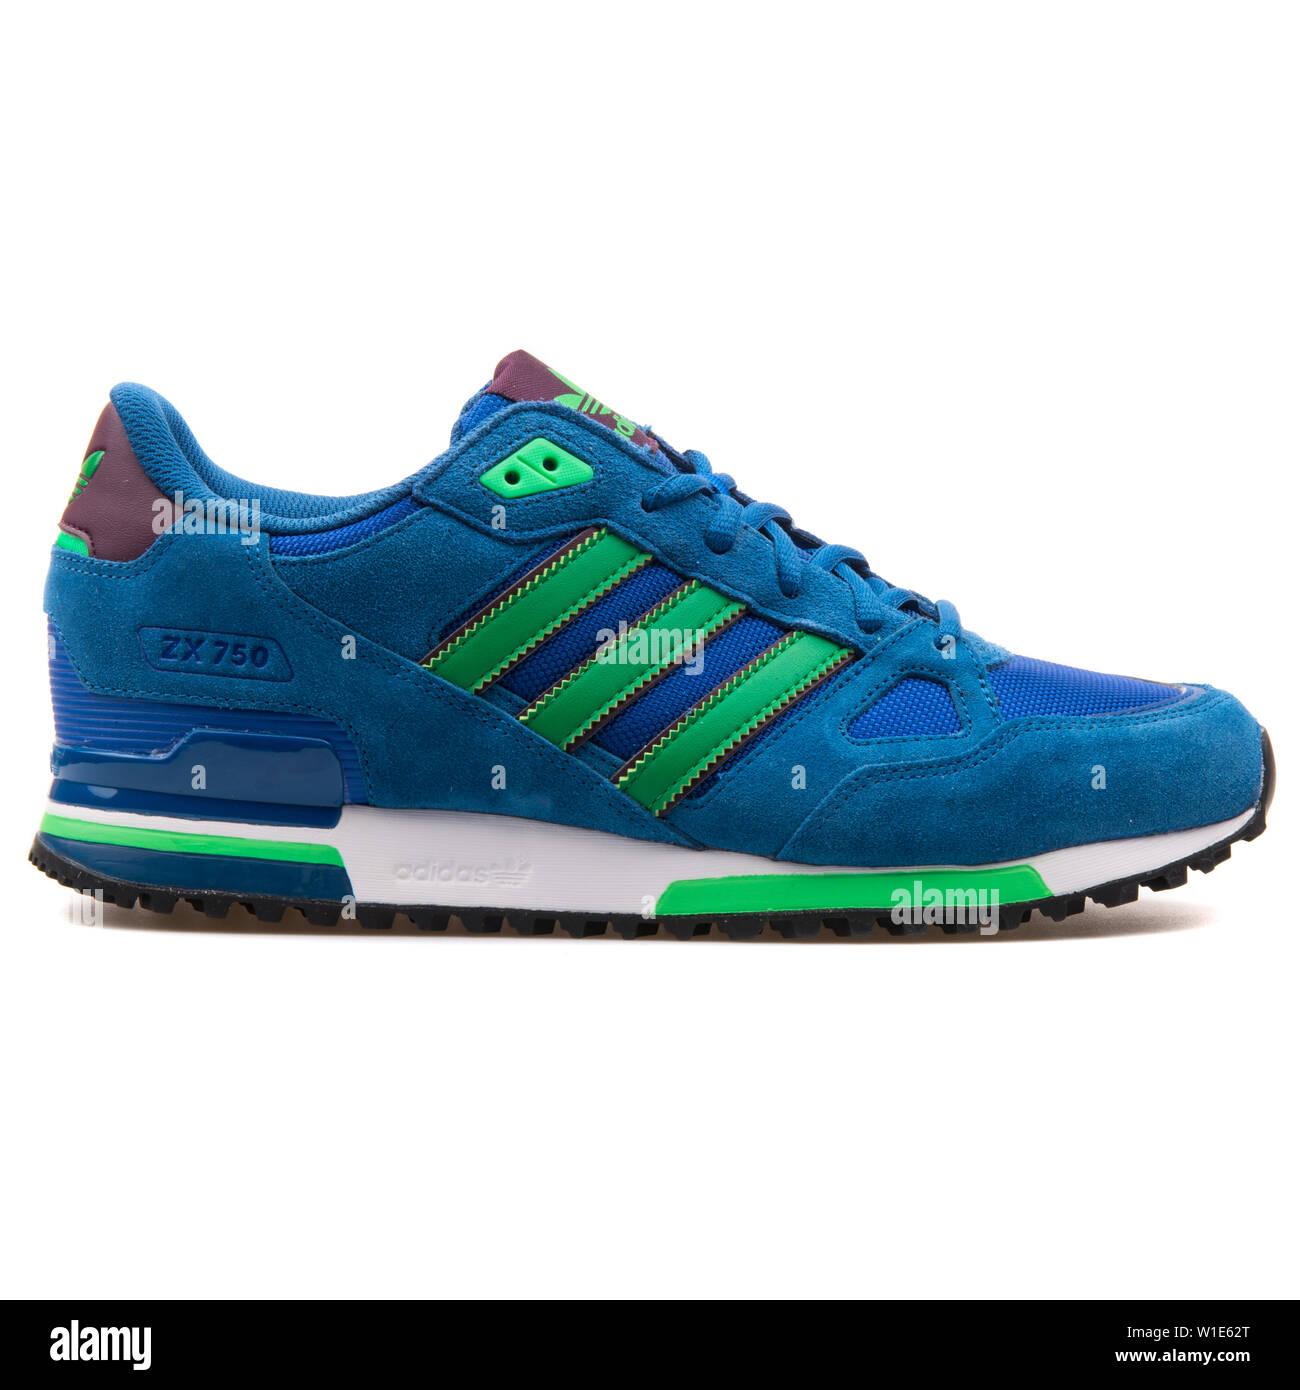 adidas zx 750 shoes schwarz adidas austria